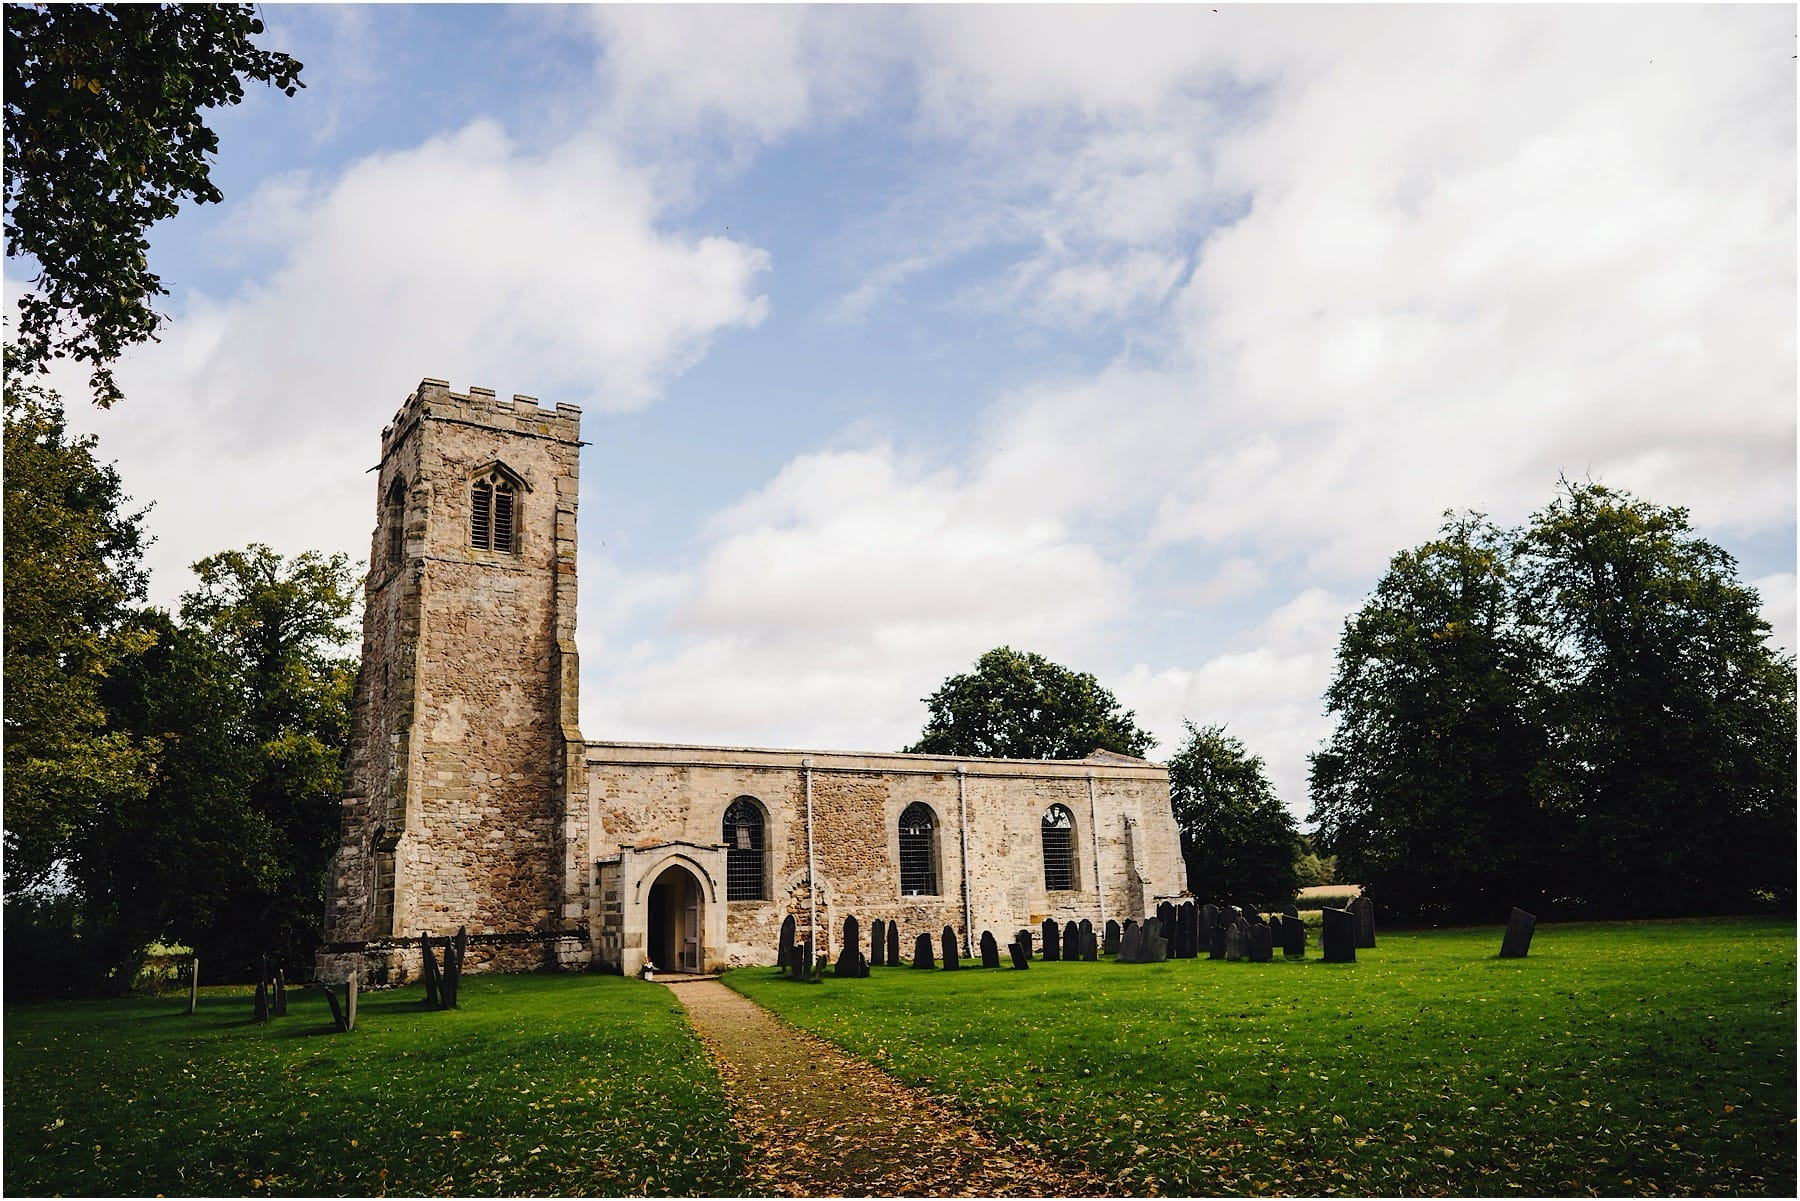 St Wistans Church, Wistow